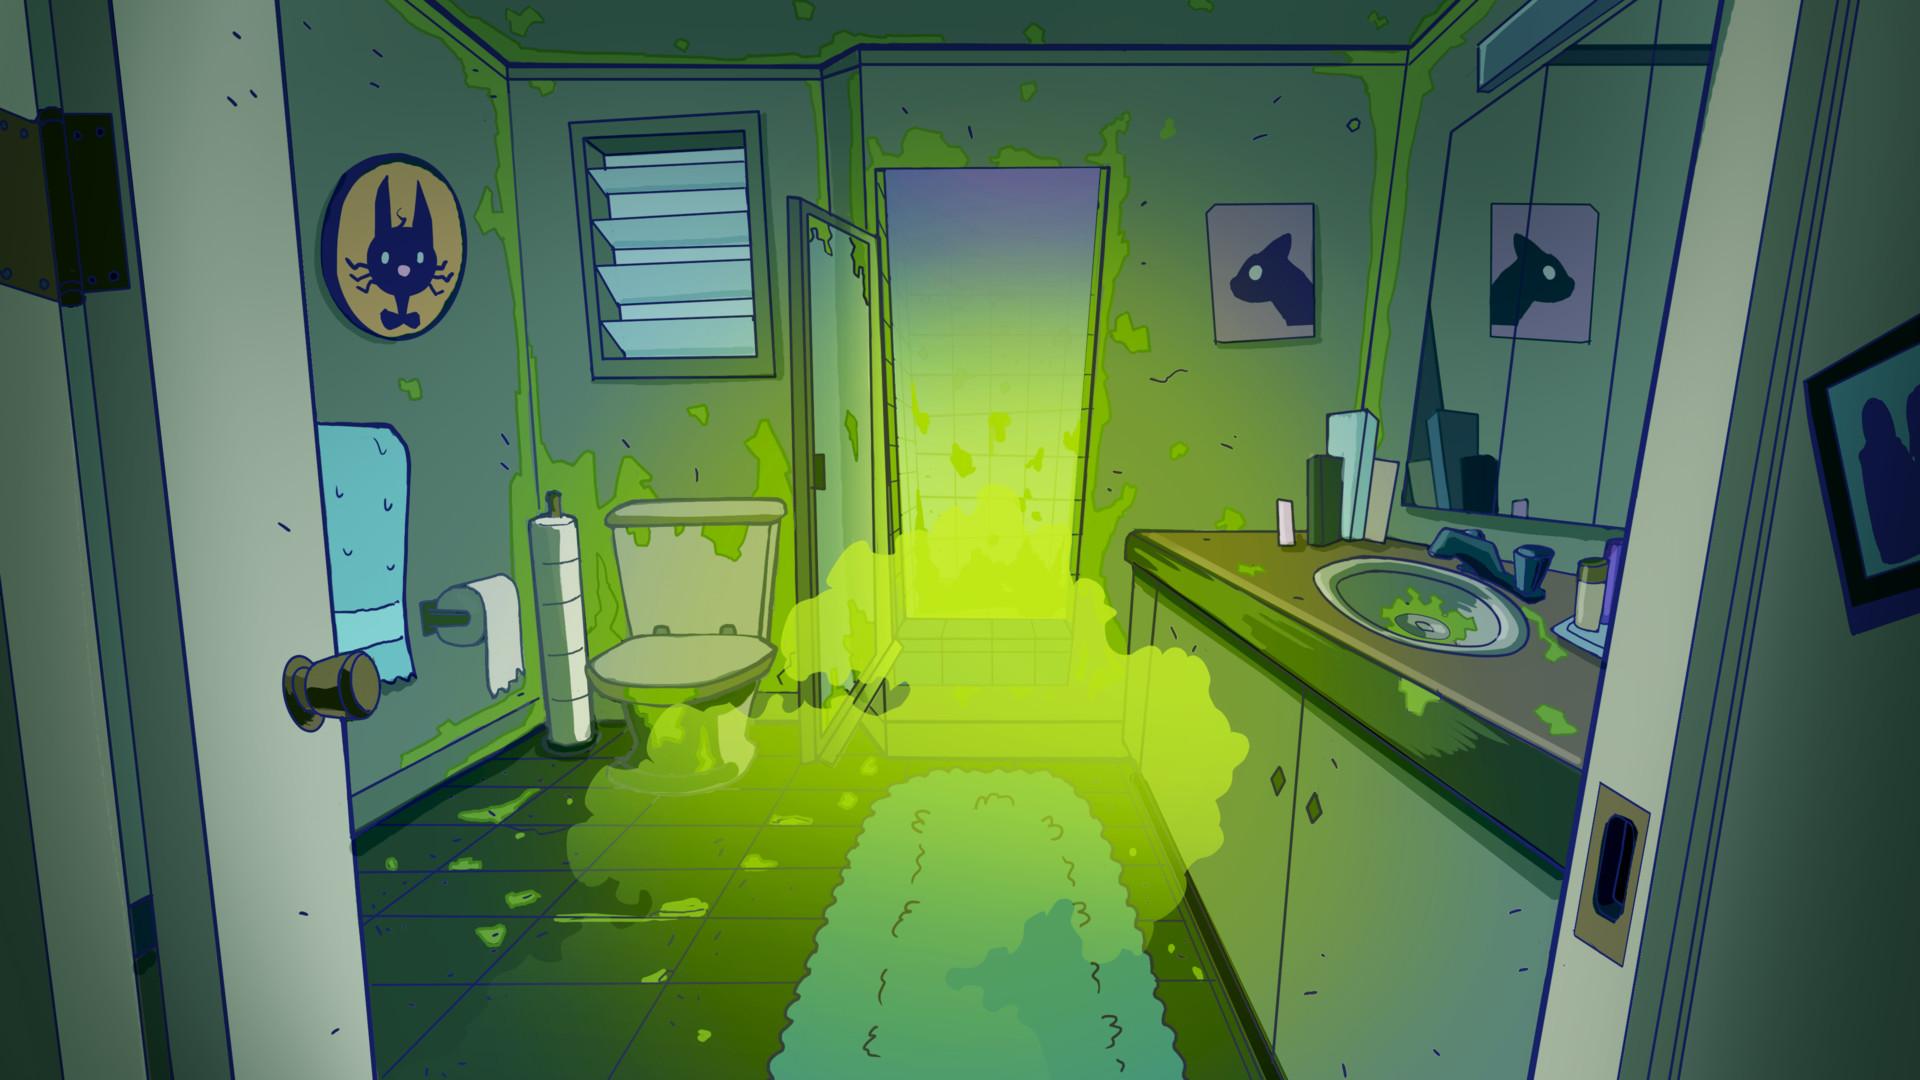 Albert carranza background scummybathroom